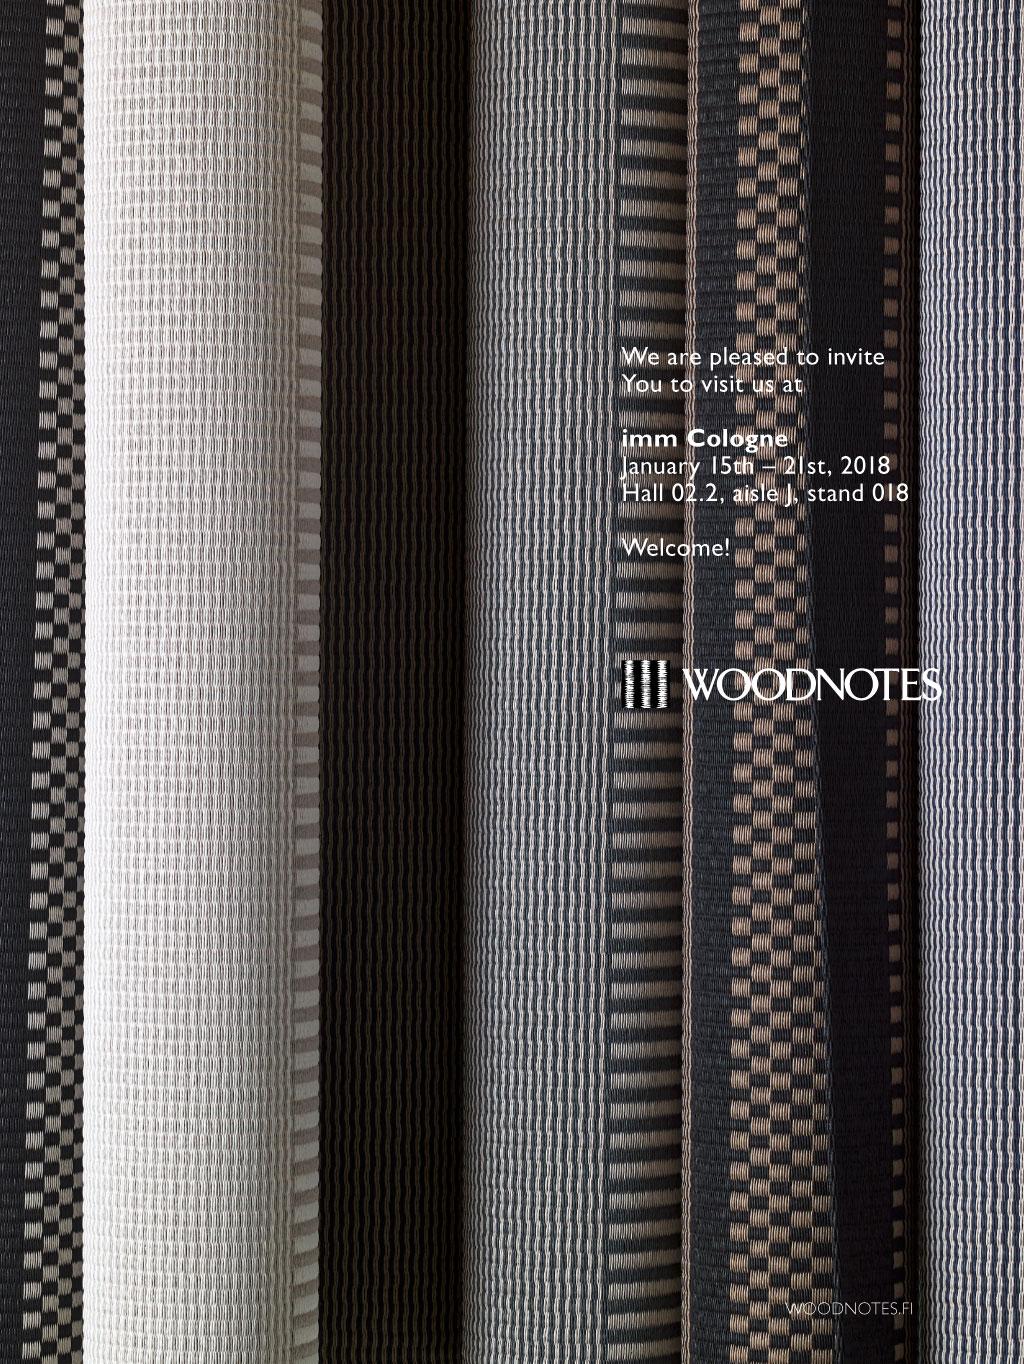 Woodnotes-invitation_Cologne_Köln-2018_1_web.jpg